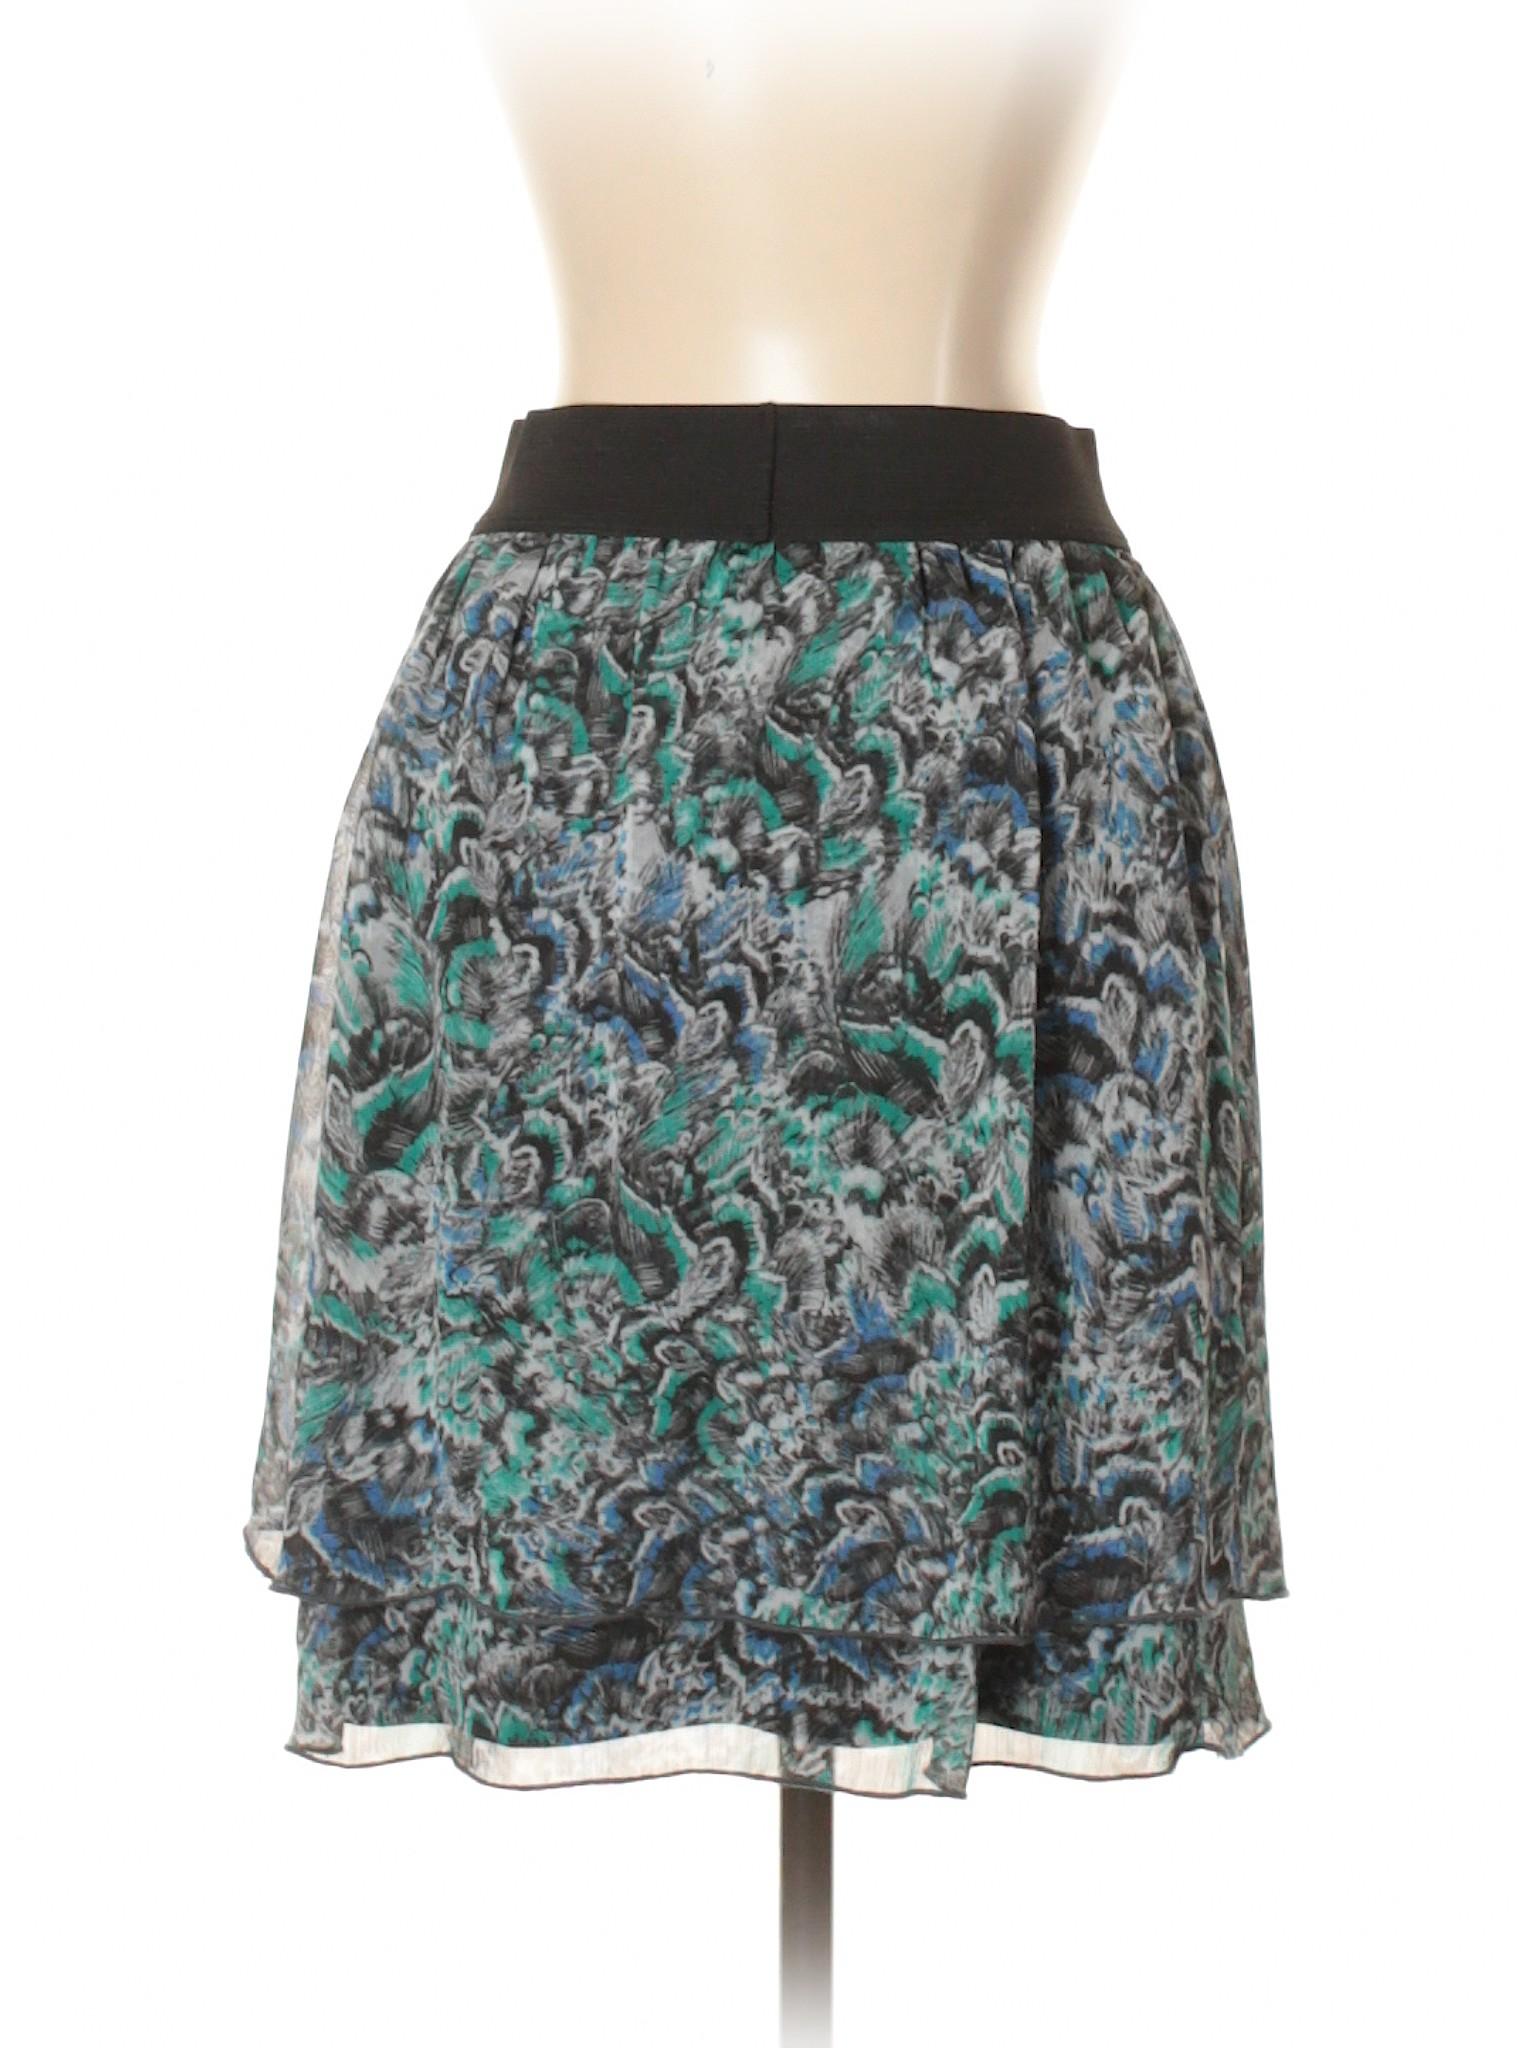 Boutique Casual Skirt Skirt Boutique Casual Skirt Skirt Casual Boutique Boutique Casual ngU8wncSqA